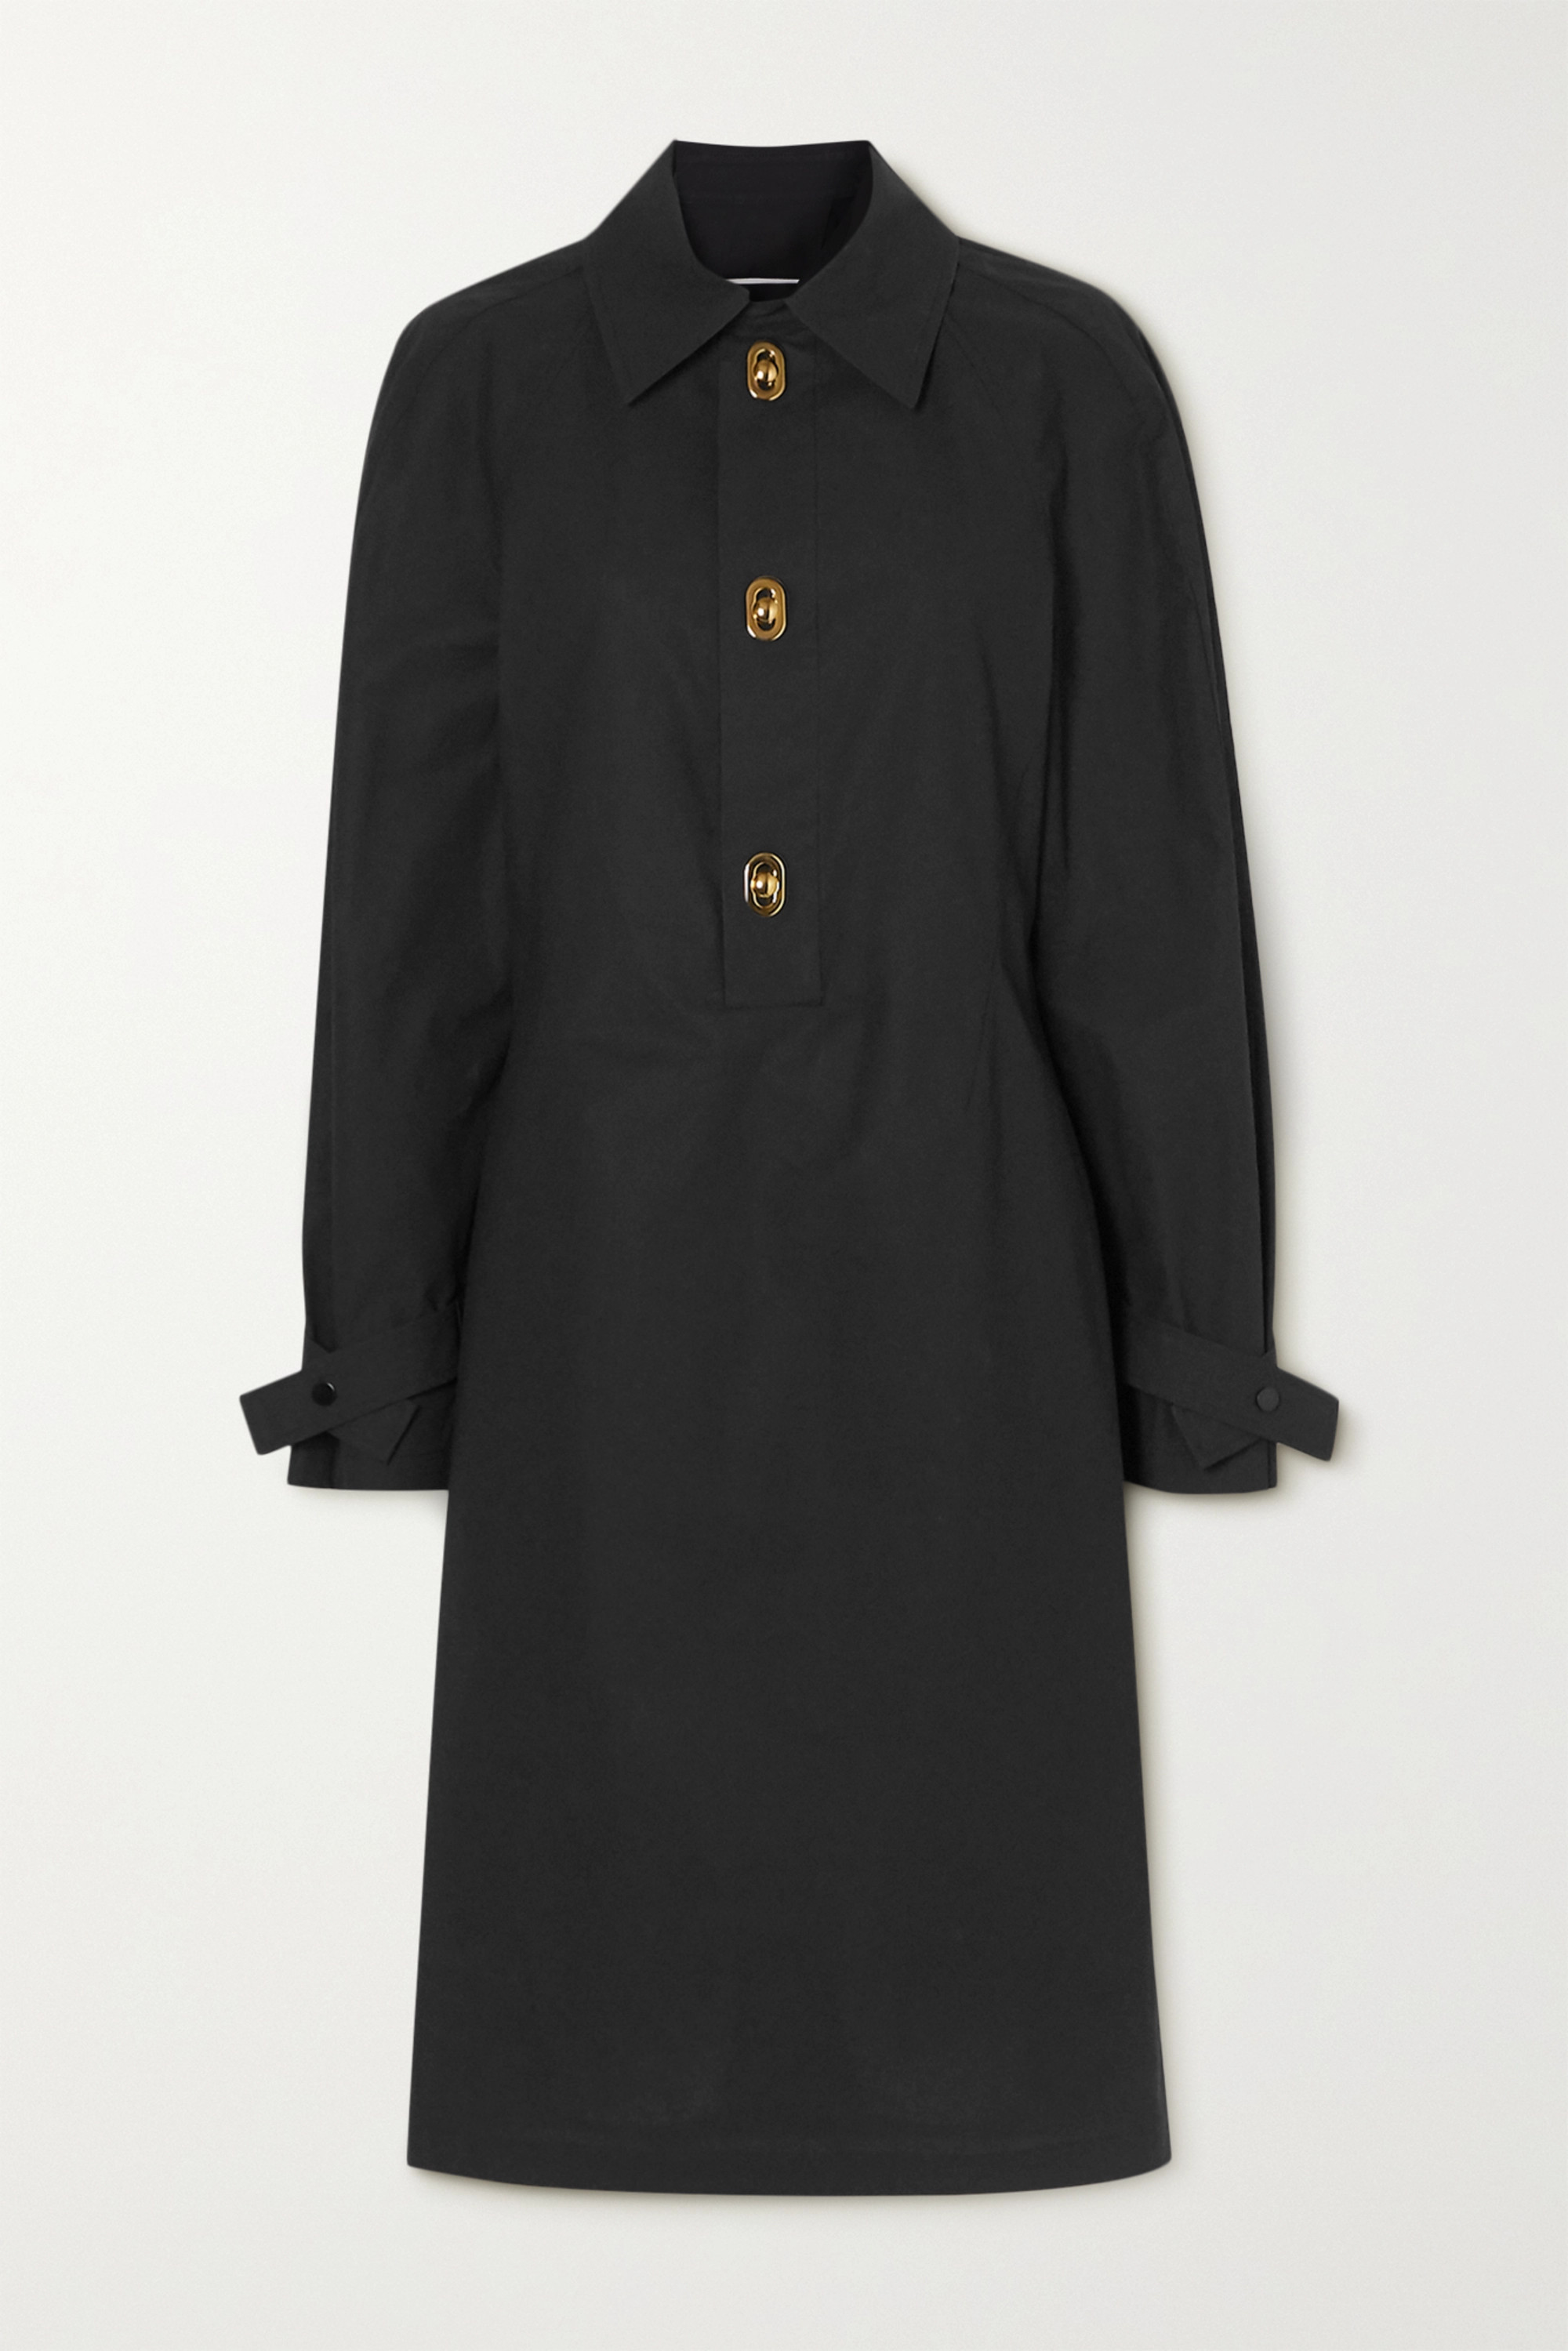 Bottega Veneta 涂层纯棉连衣裙